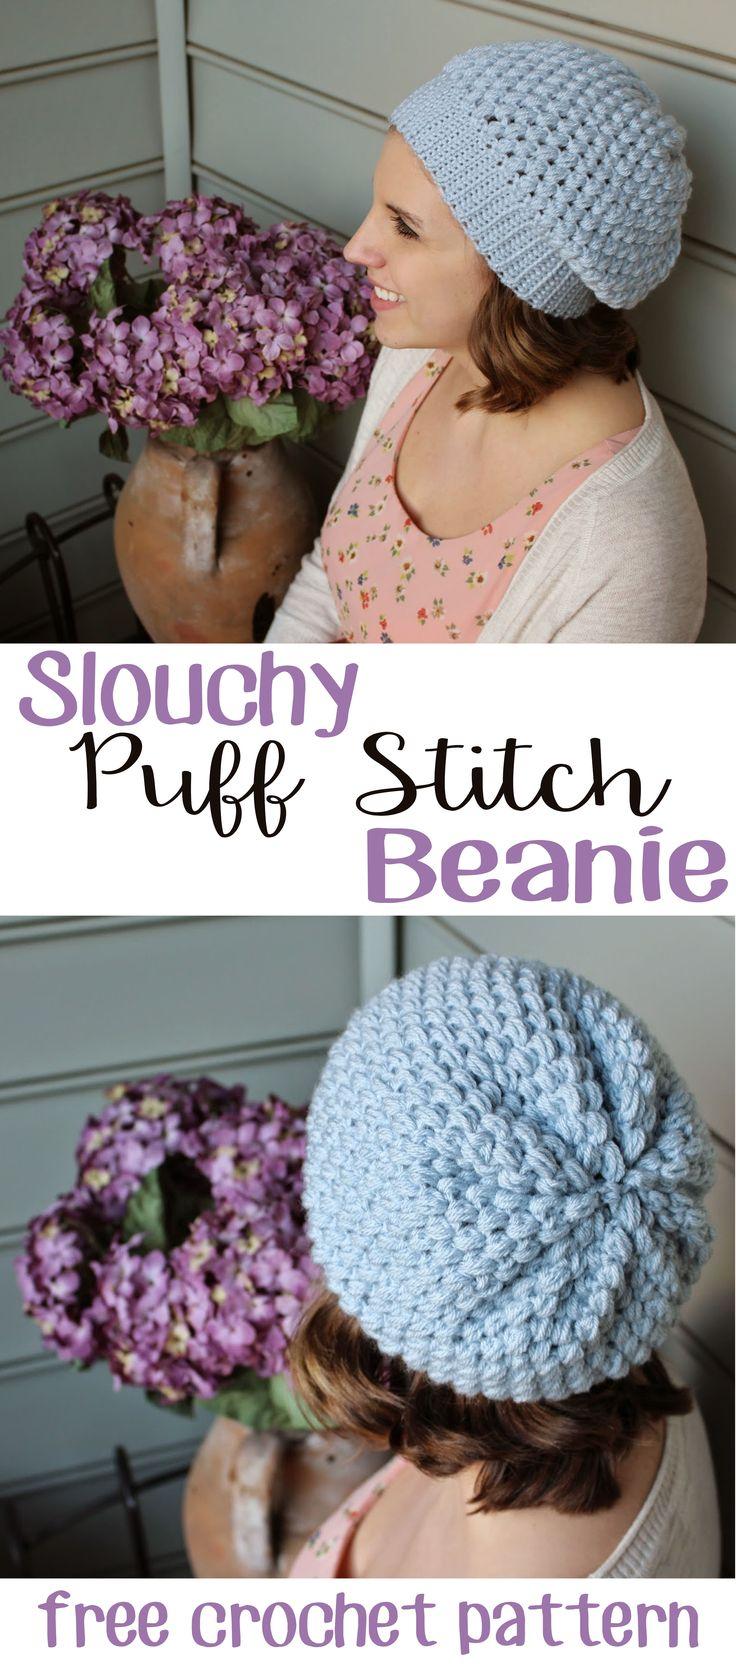 Easy Slouchy Puff Stitch Beanie   Free Crochet Pattern from Sewrella